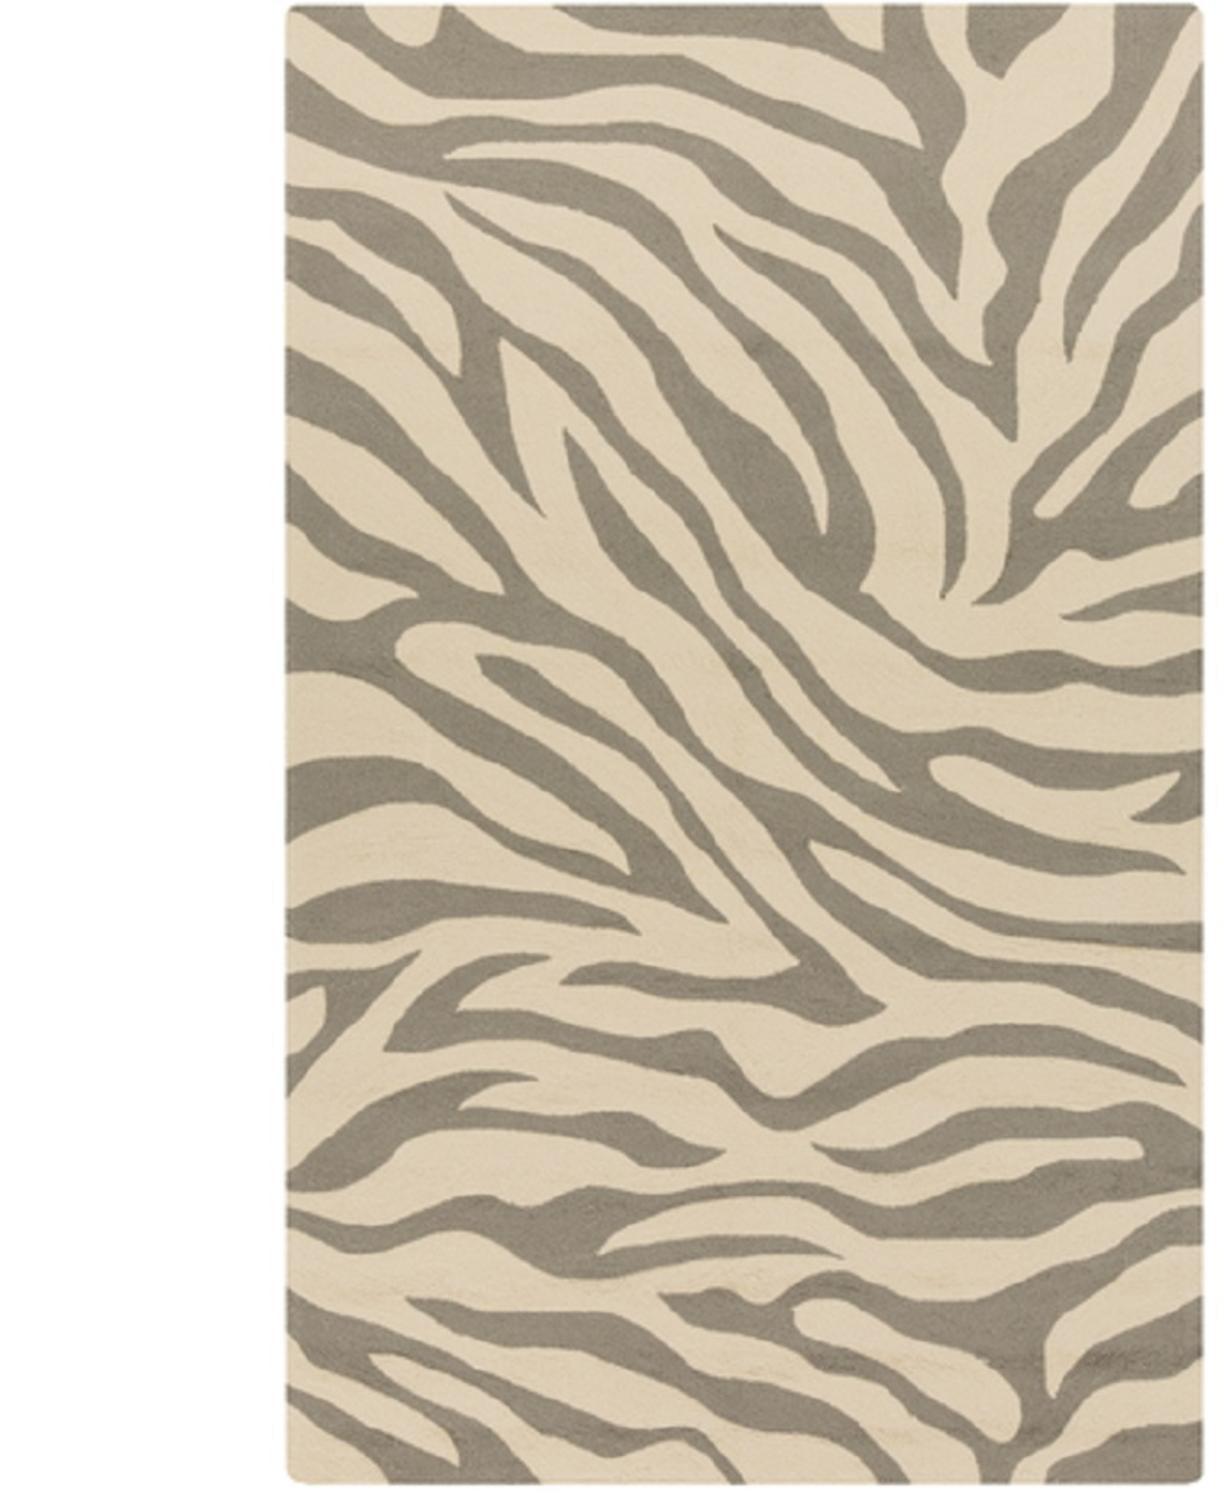 Animal Print Throw Rug: 3' X 5' Exquisite Safari Sandy Brown And Light Gray Zebra